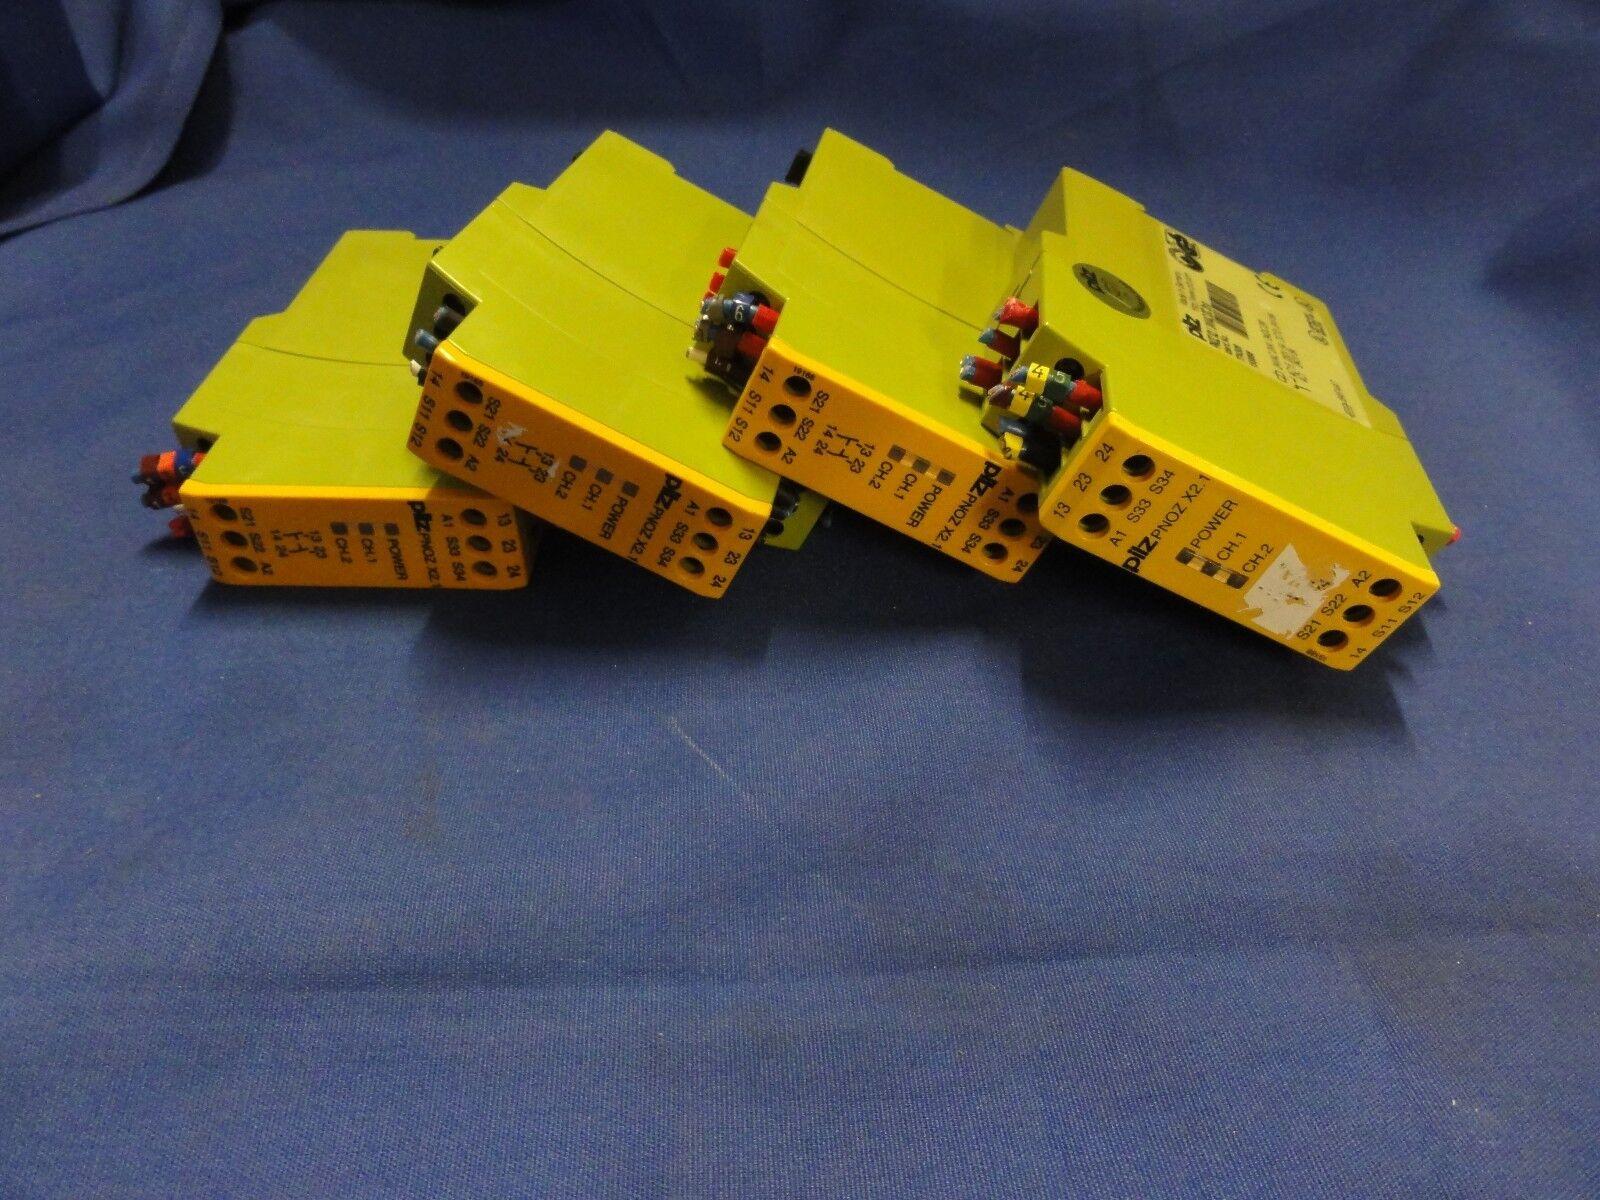 Set of 4 PILZ PNOZ X2.1 2S 774306 24VAC DC 2n o Safety Relay